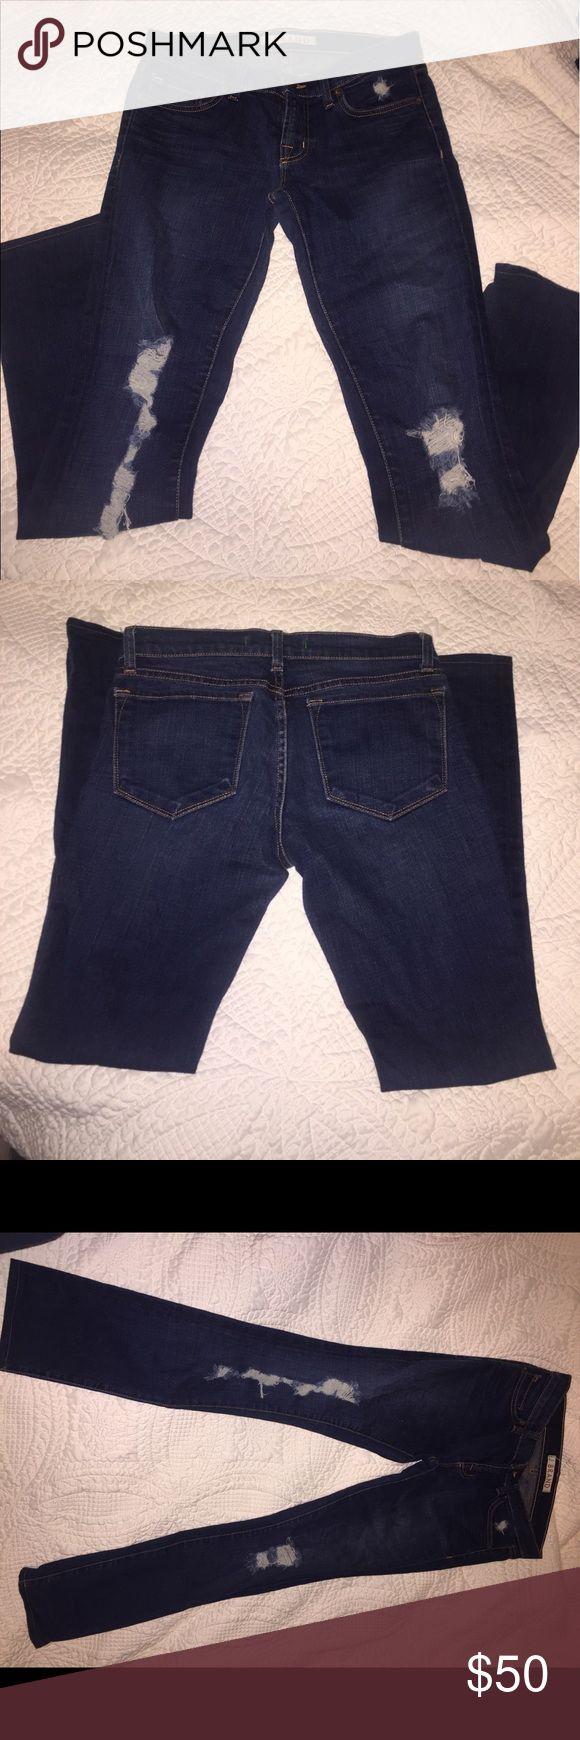 J Brand distressed skinny jeans Like new size 27 skinny jeans. Dark wash. Unfortunately they no longer fit me J Brand Jeans